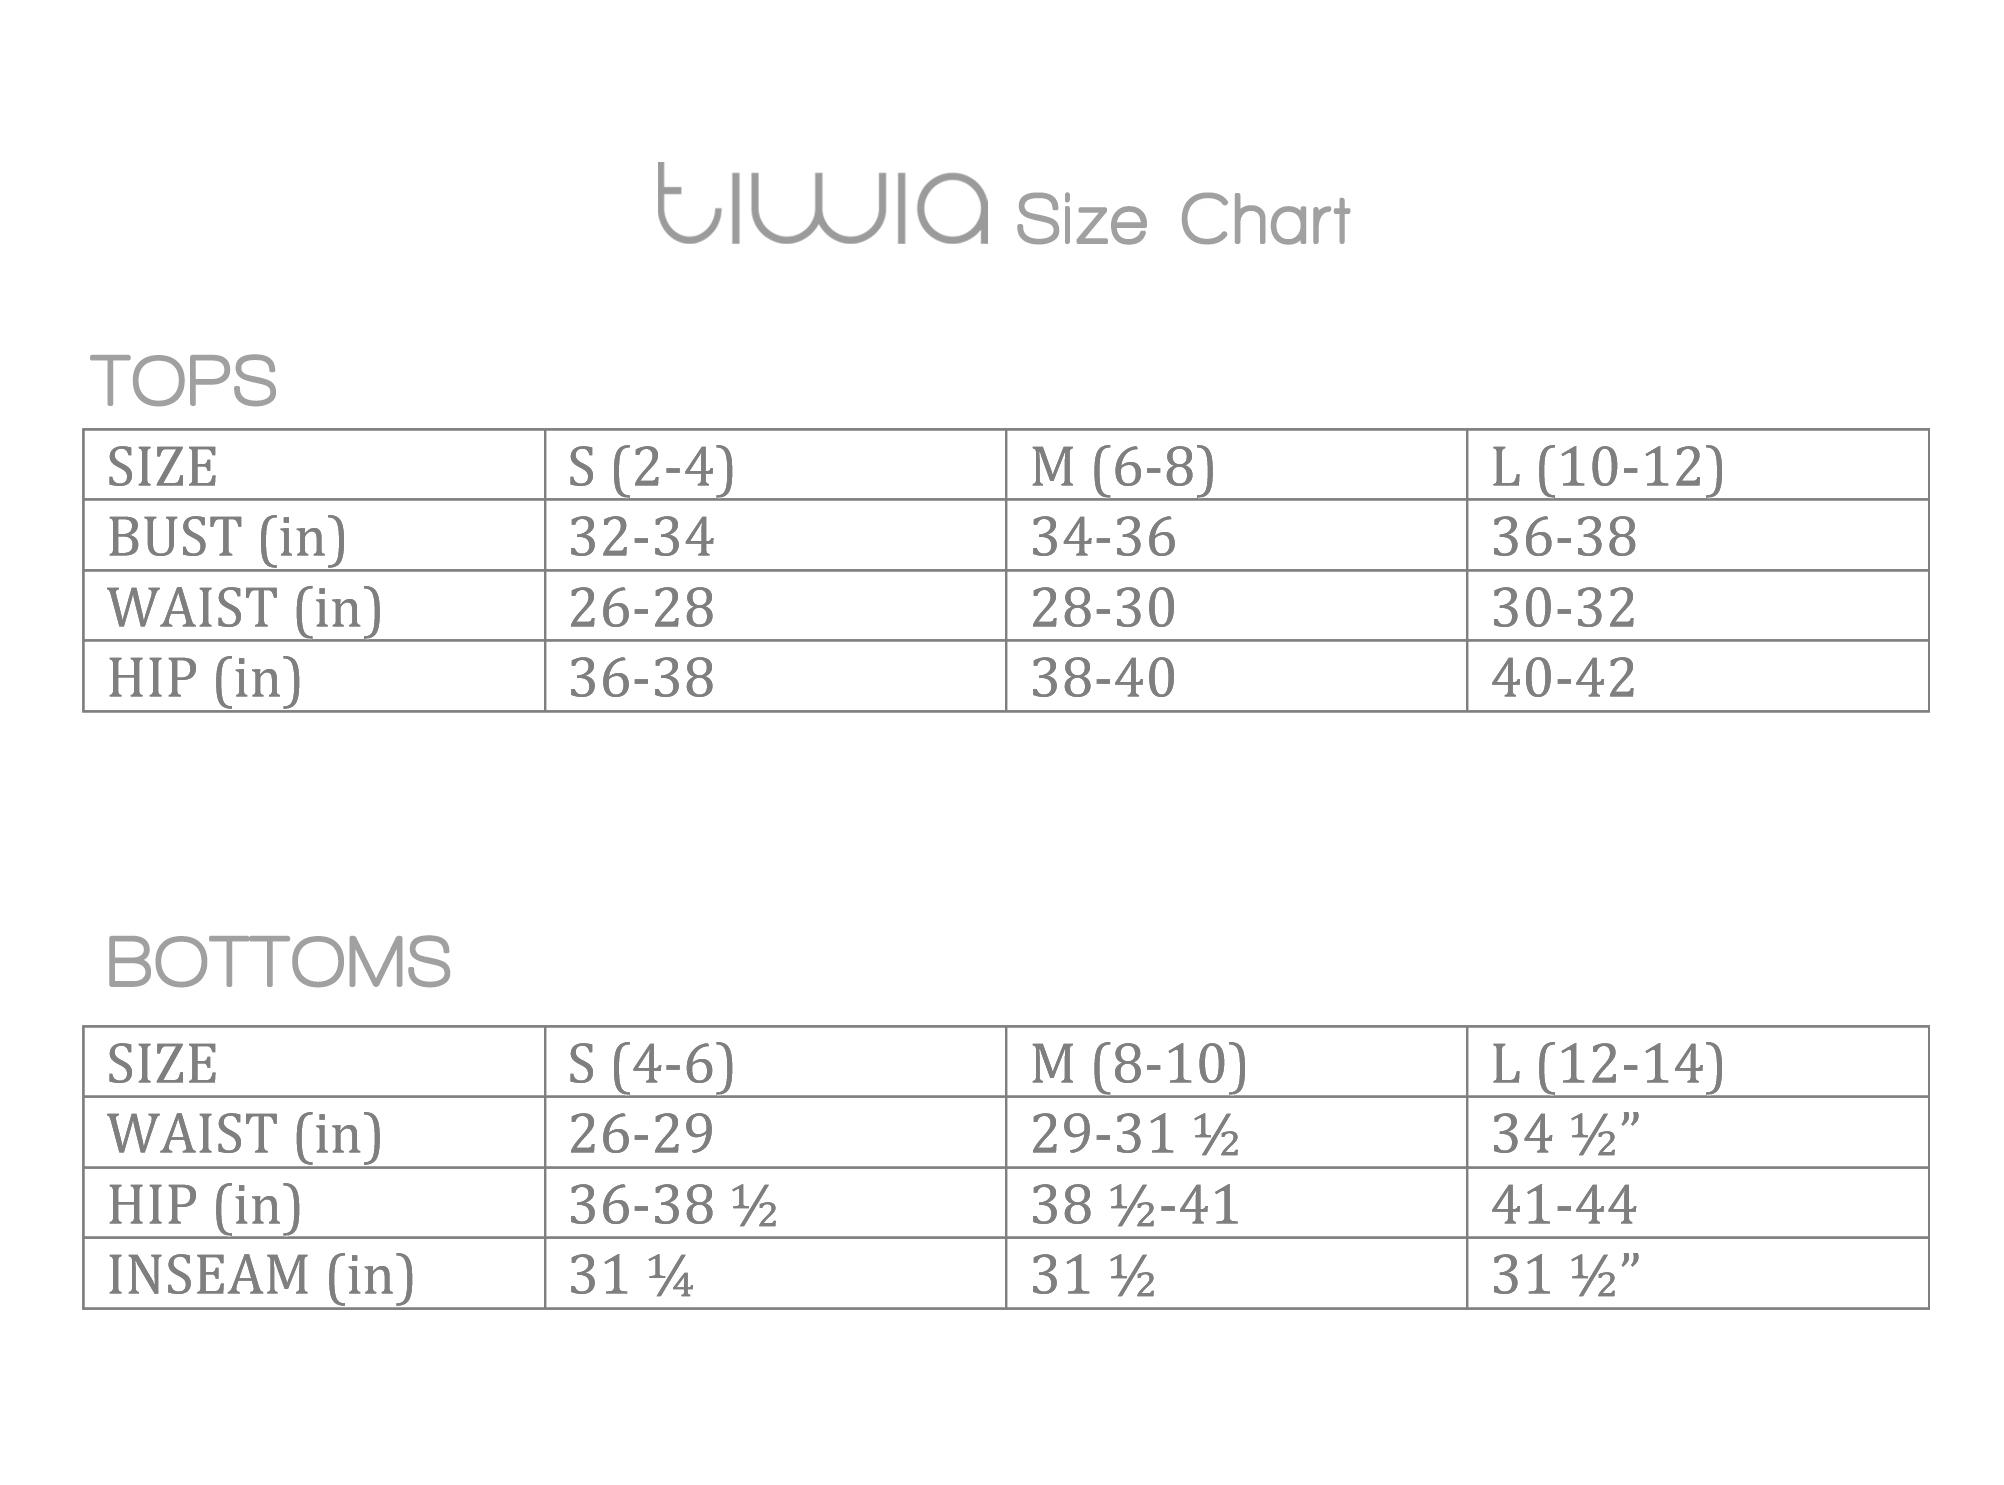 tiwia size chart 750px wide.jpg